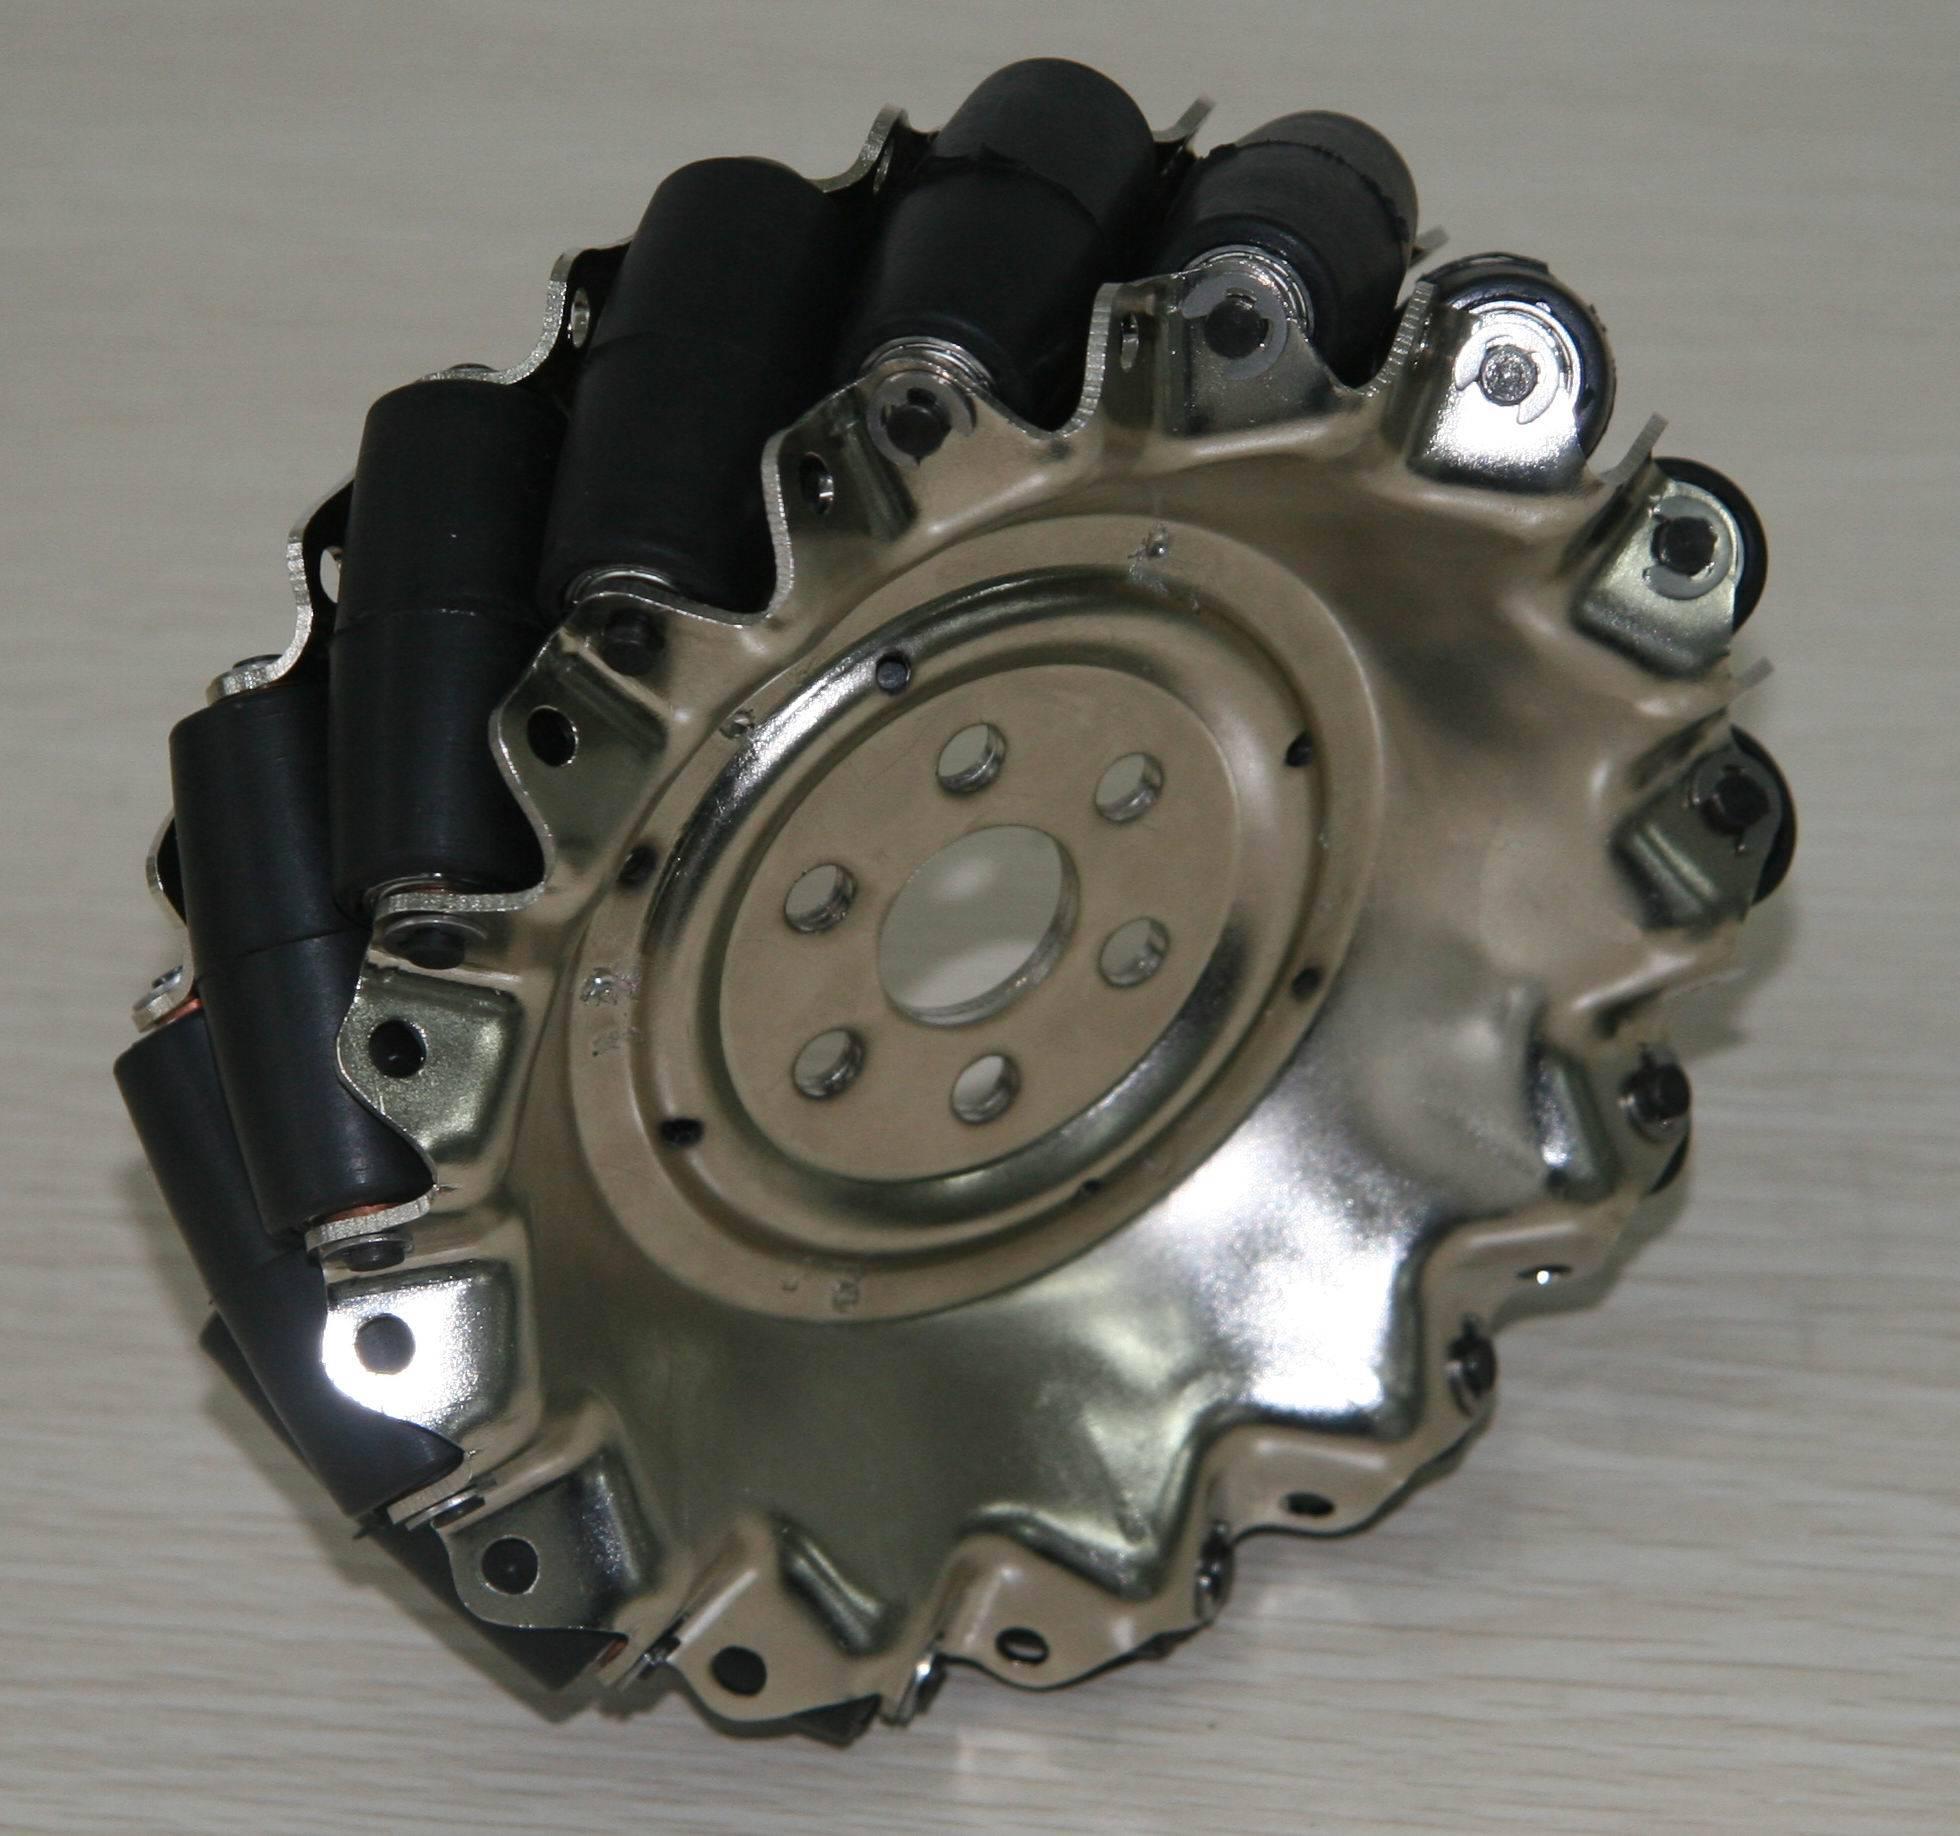 152.4mm steel mecanum wheel QMA-15